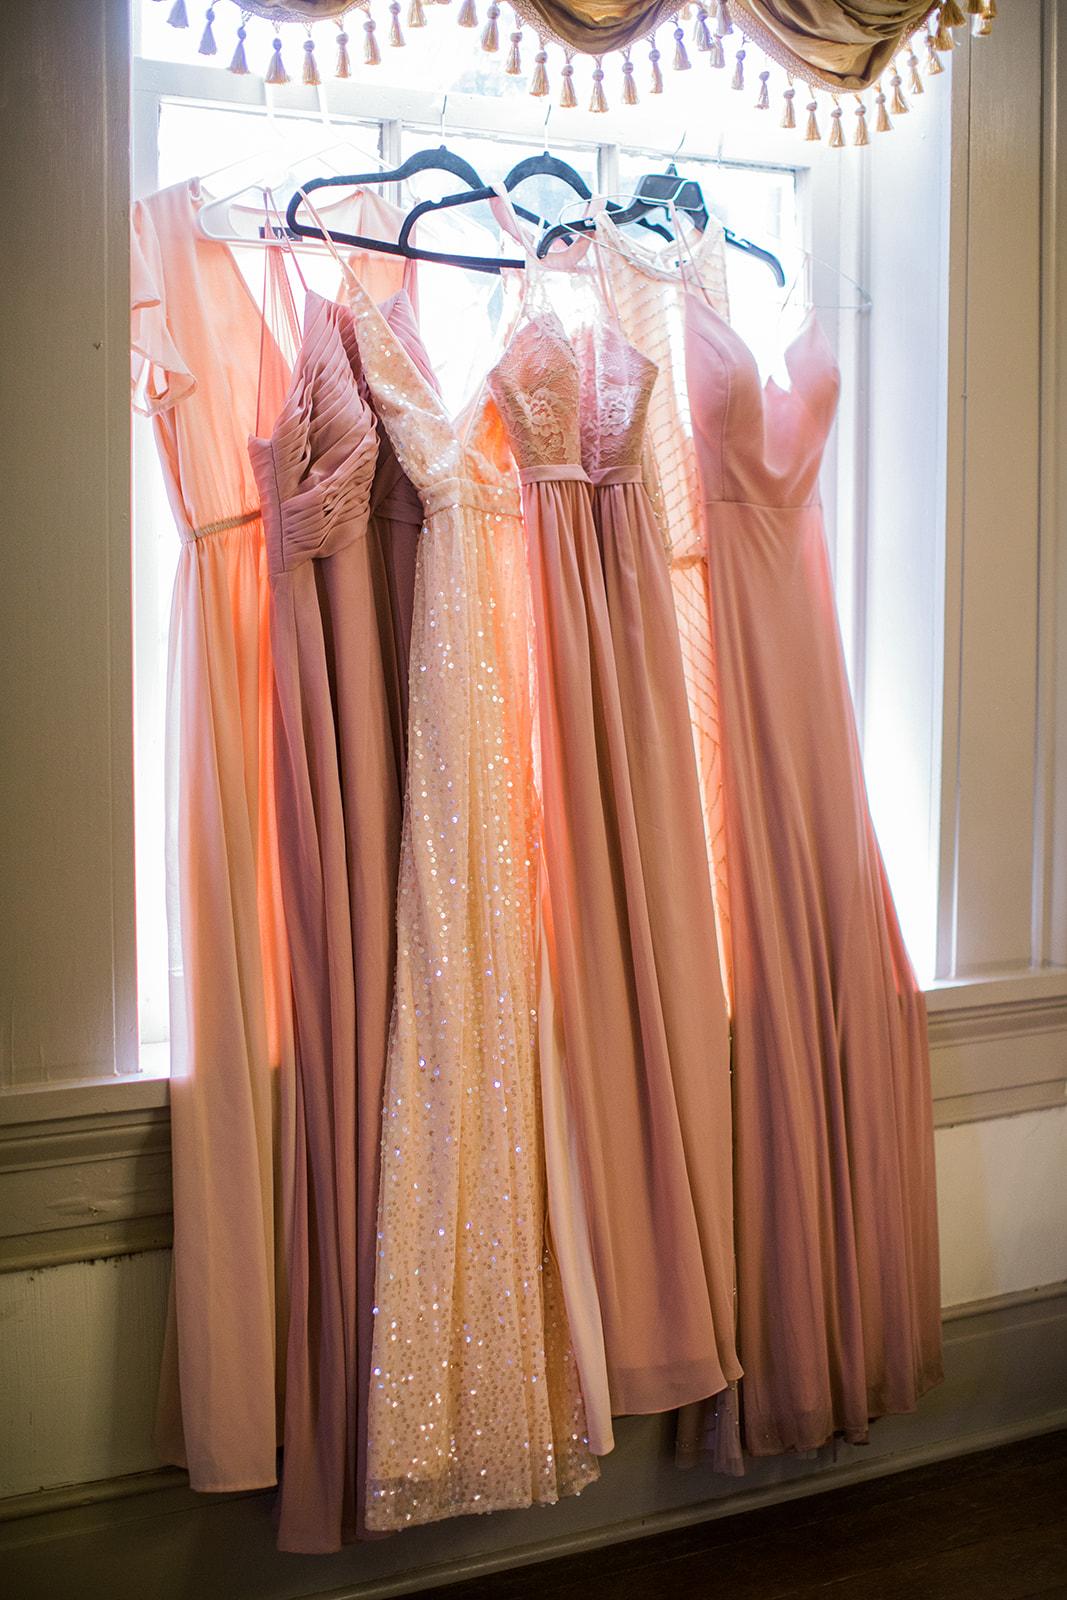 Mismatched blush pink bridesmaids dresses | Nashville Bride Guide